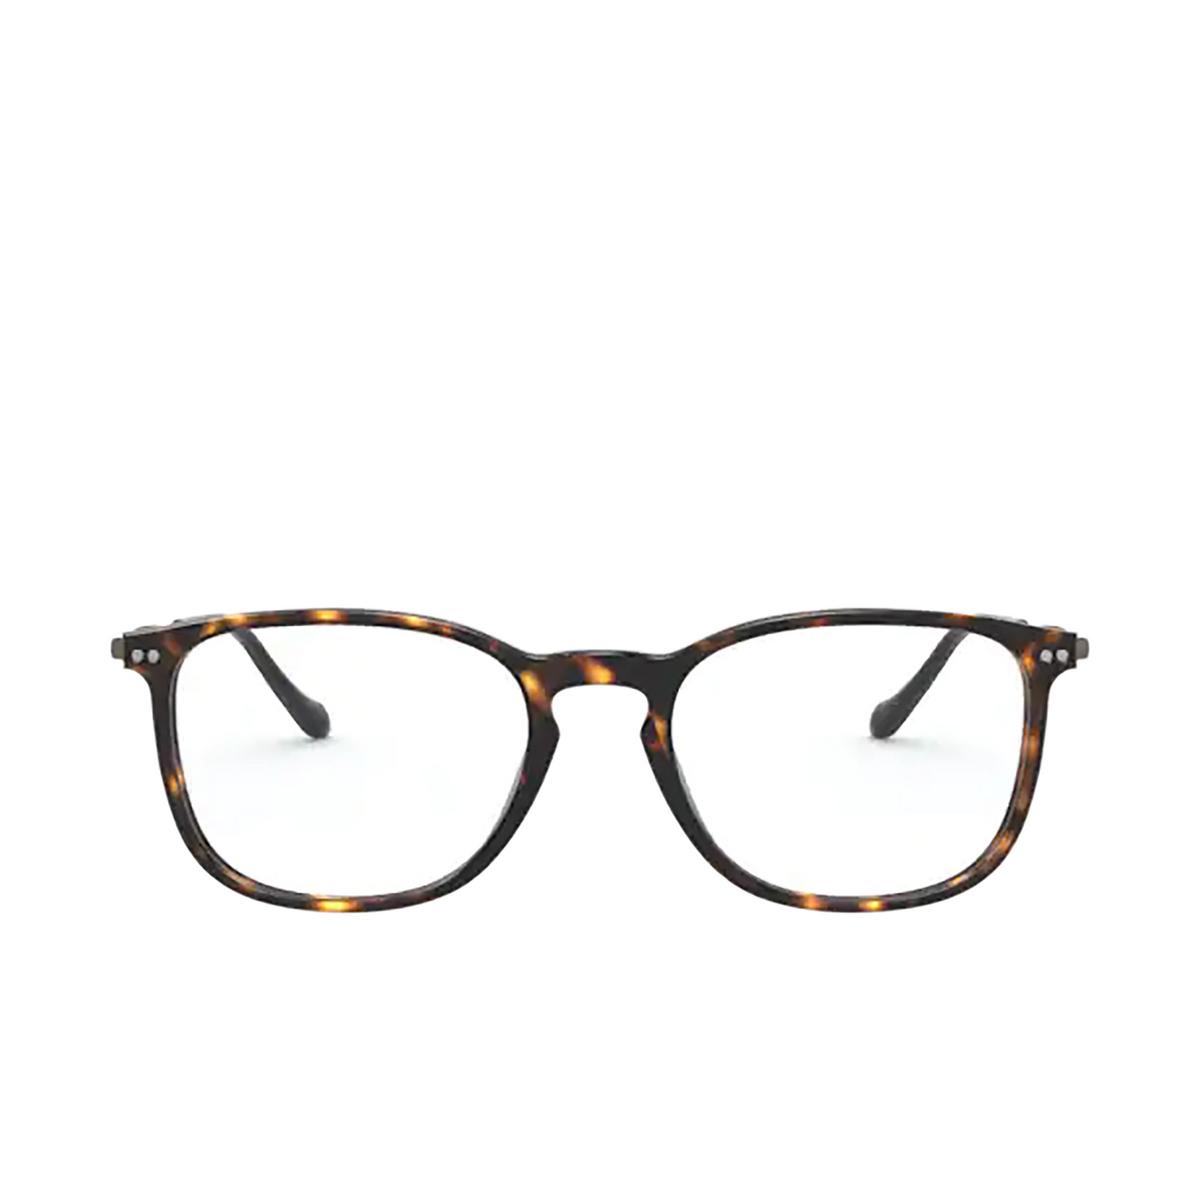 Giorgio Armani® Rectangle Eyeglasses: AR7190 color Dark Havana 5026 - front view.